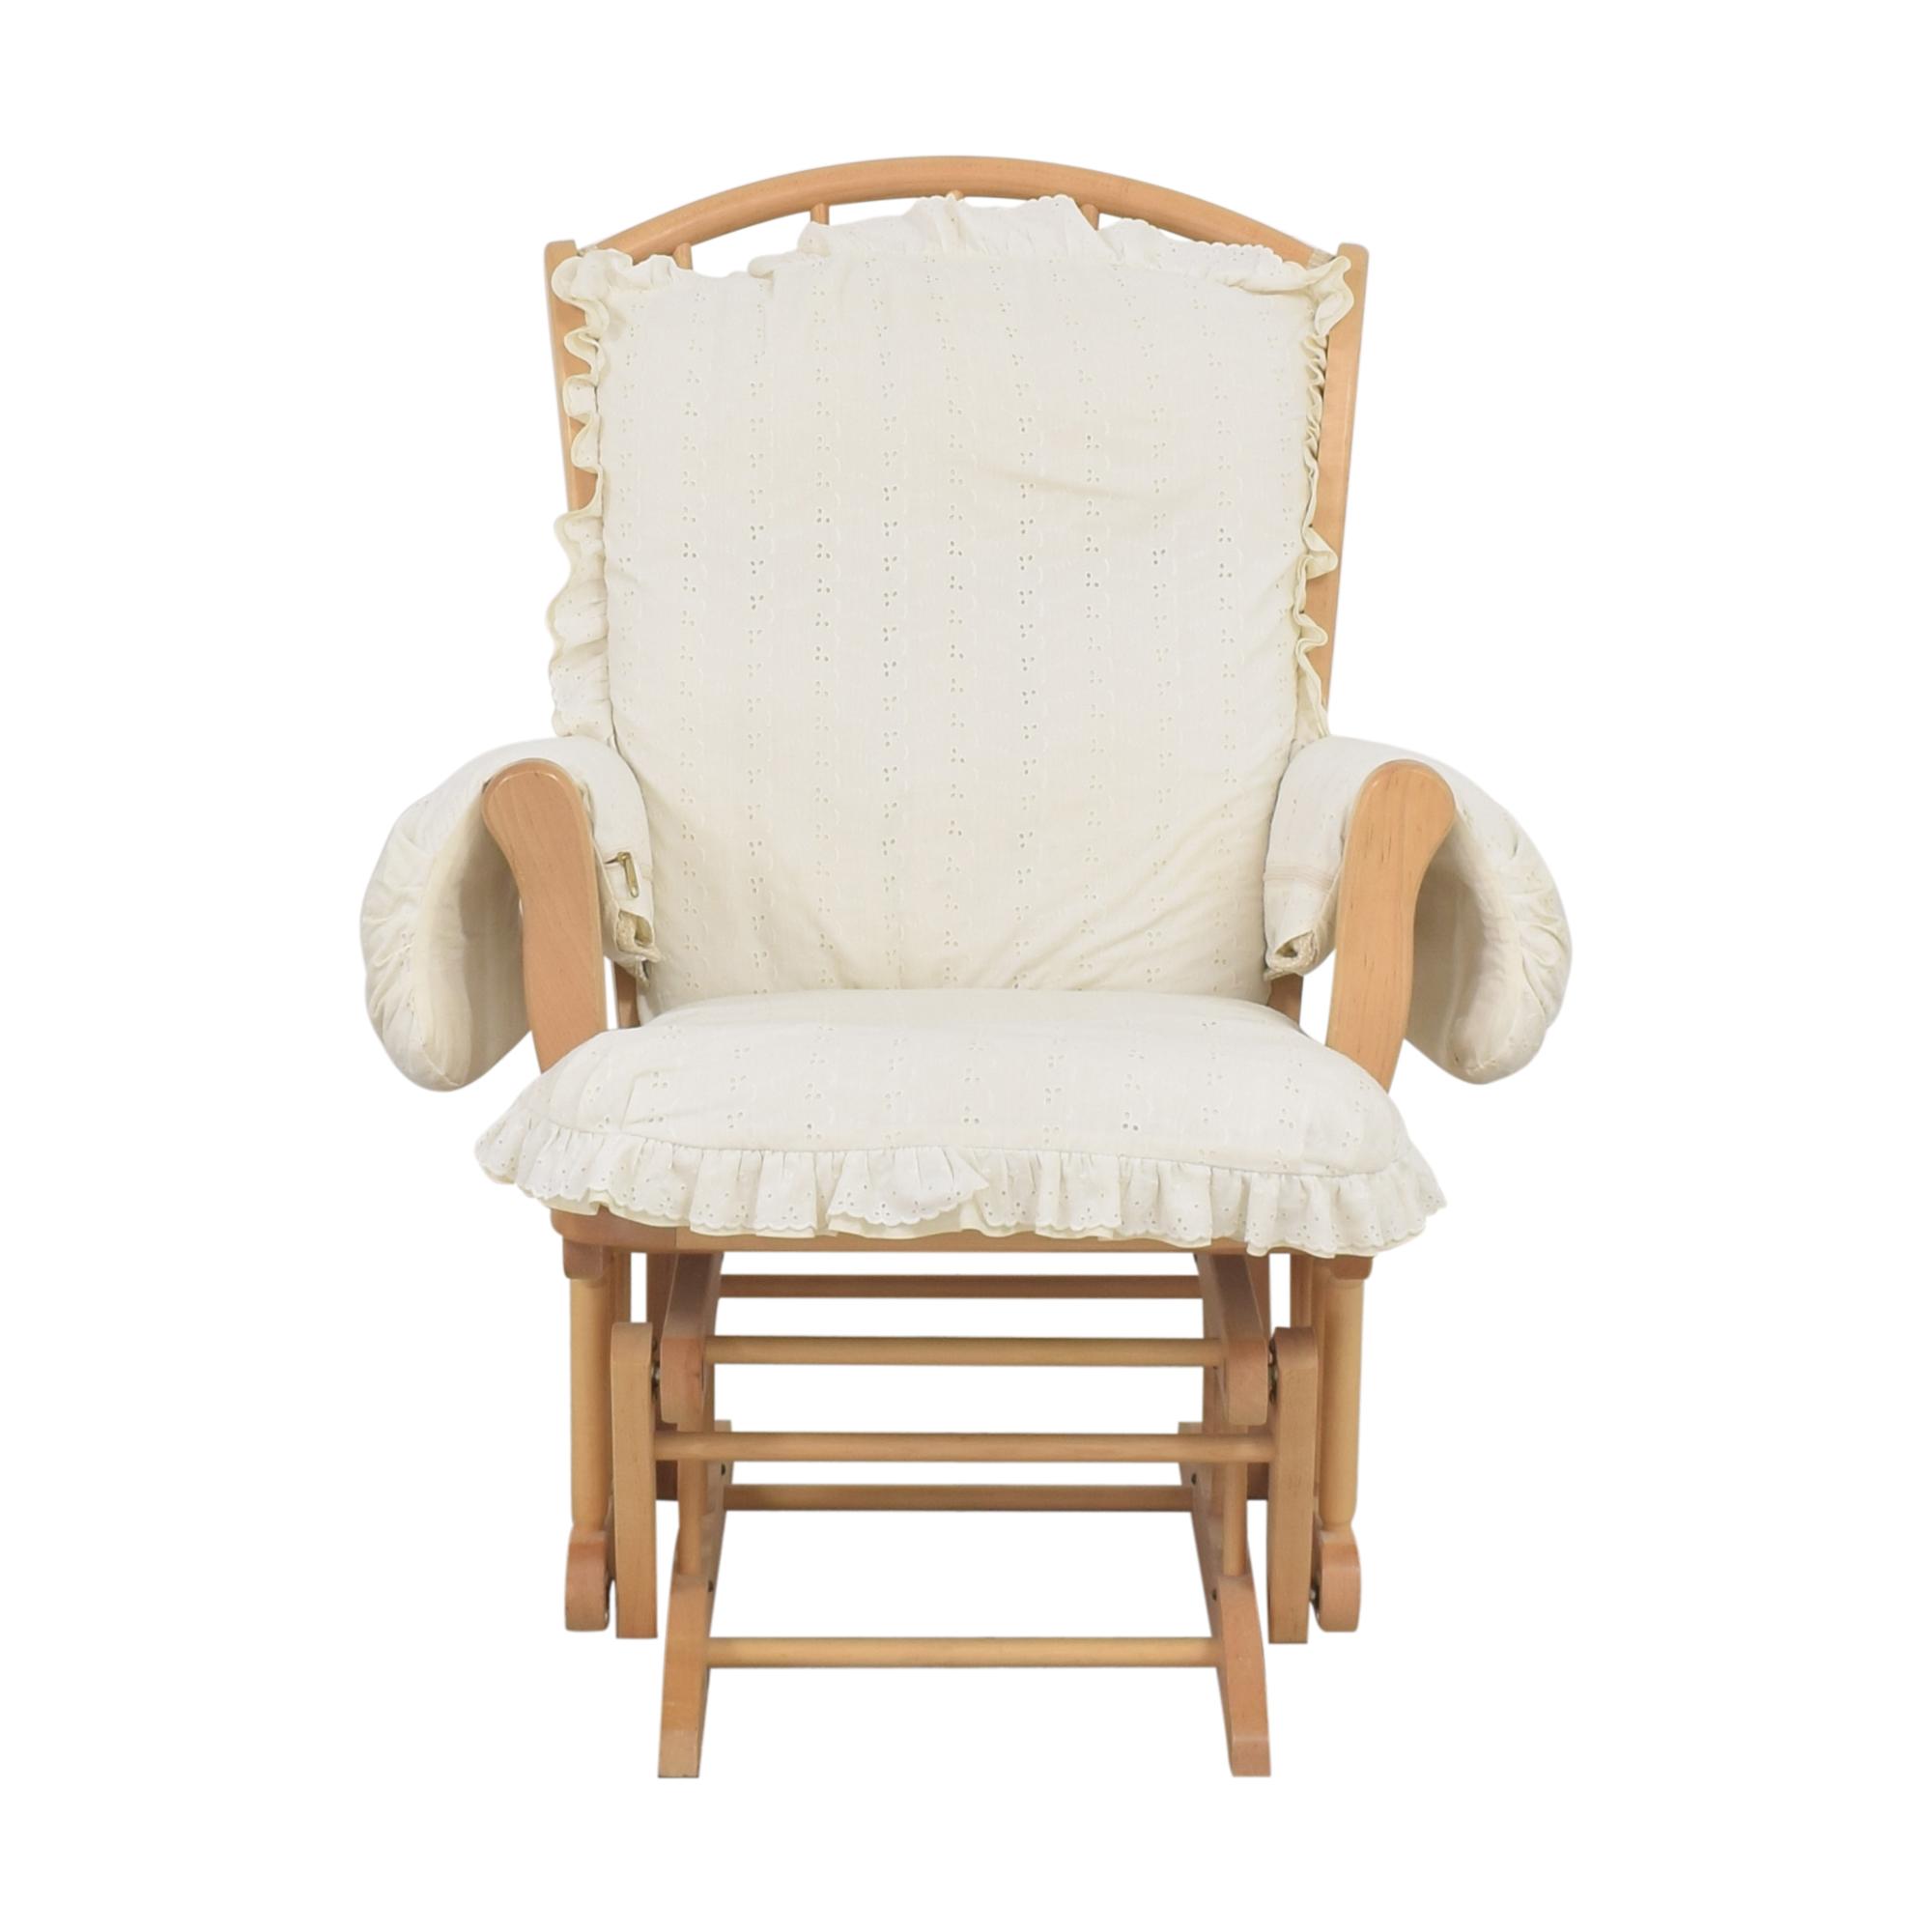 Dutailier Dutailier Glider Chair dimensions